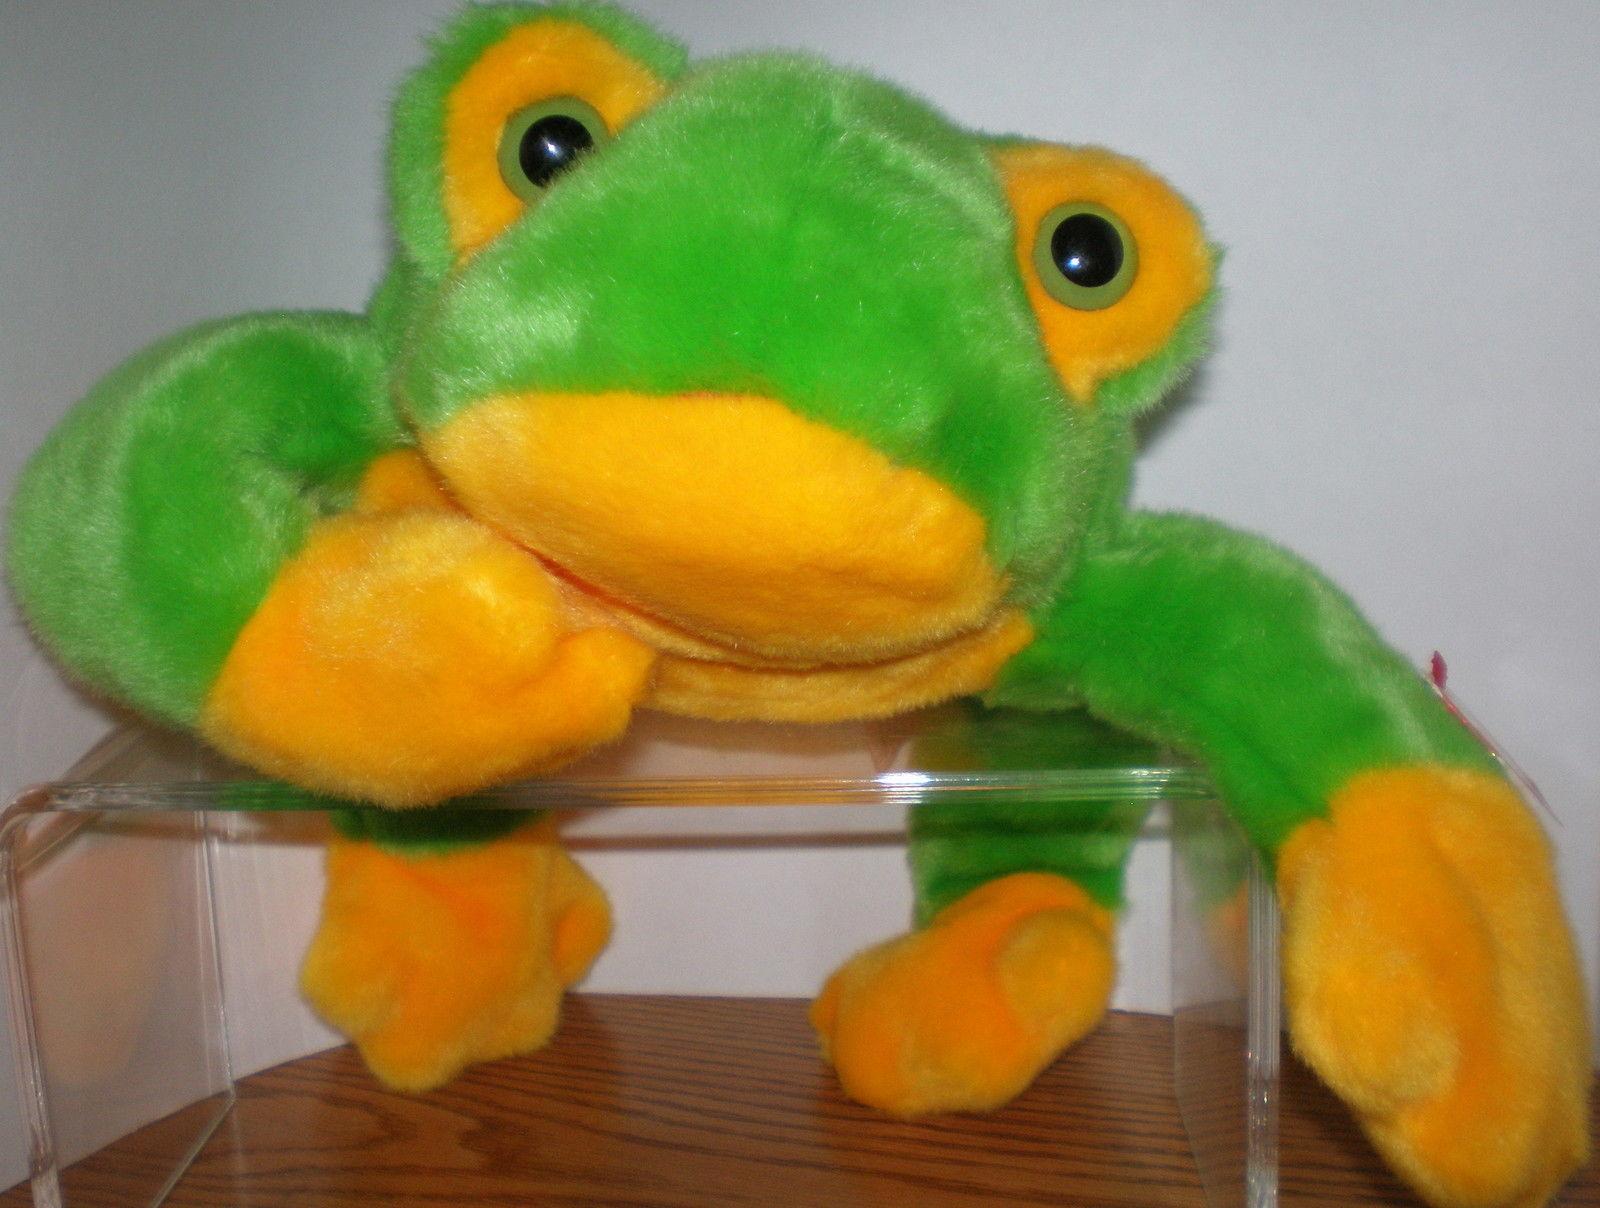 918c392ec9d kgrhqv mee6d pjchmbolif9 z5g 60 57. kgrhqv mee6d pjchmbolif9 z5g 60 57. Ty  Beanie Buddy Smoochy the Green Frog MWMT Collectors Quality